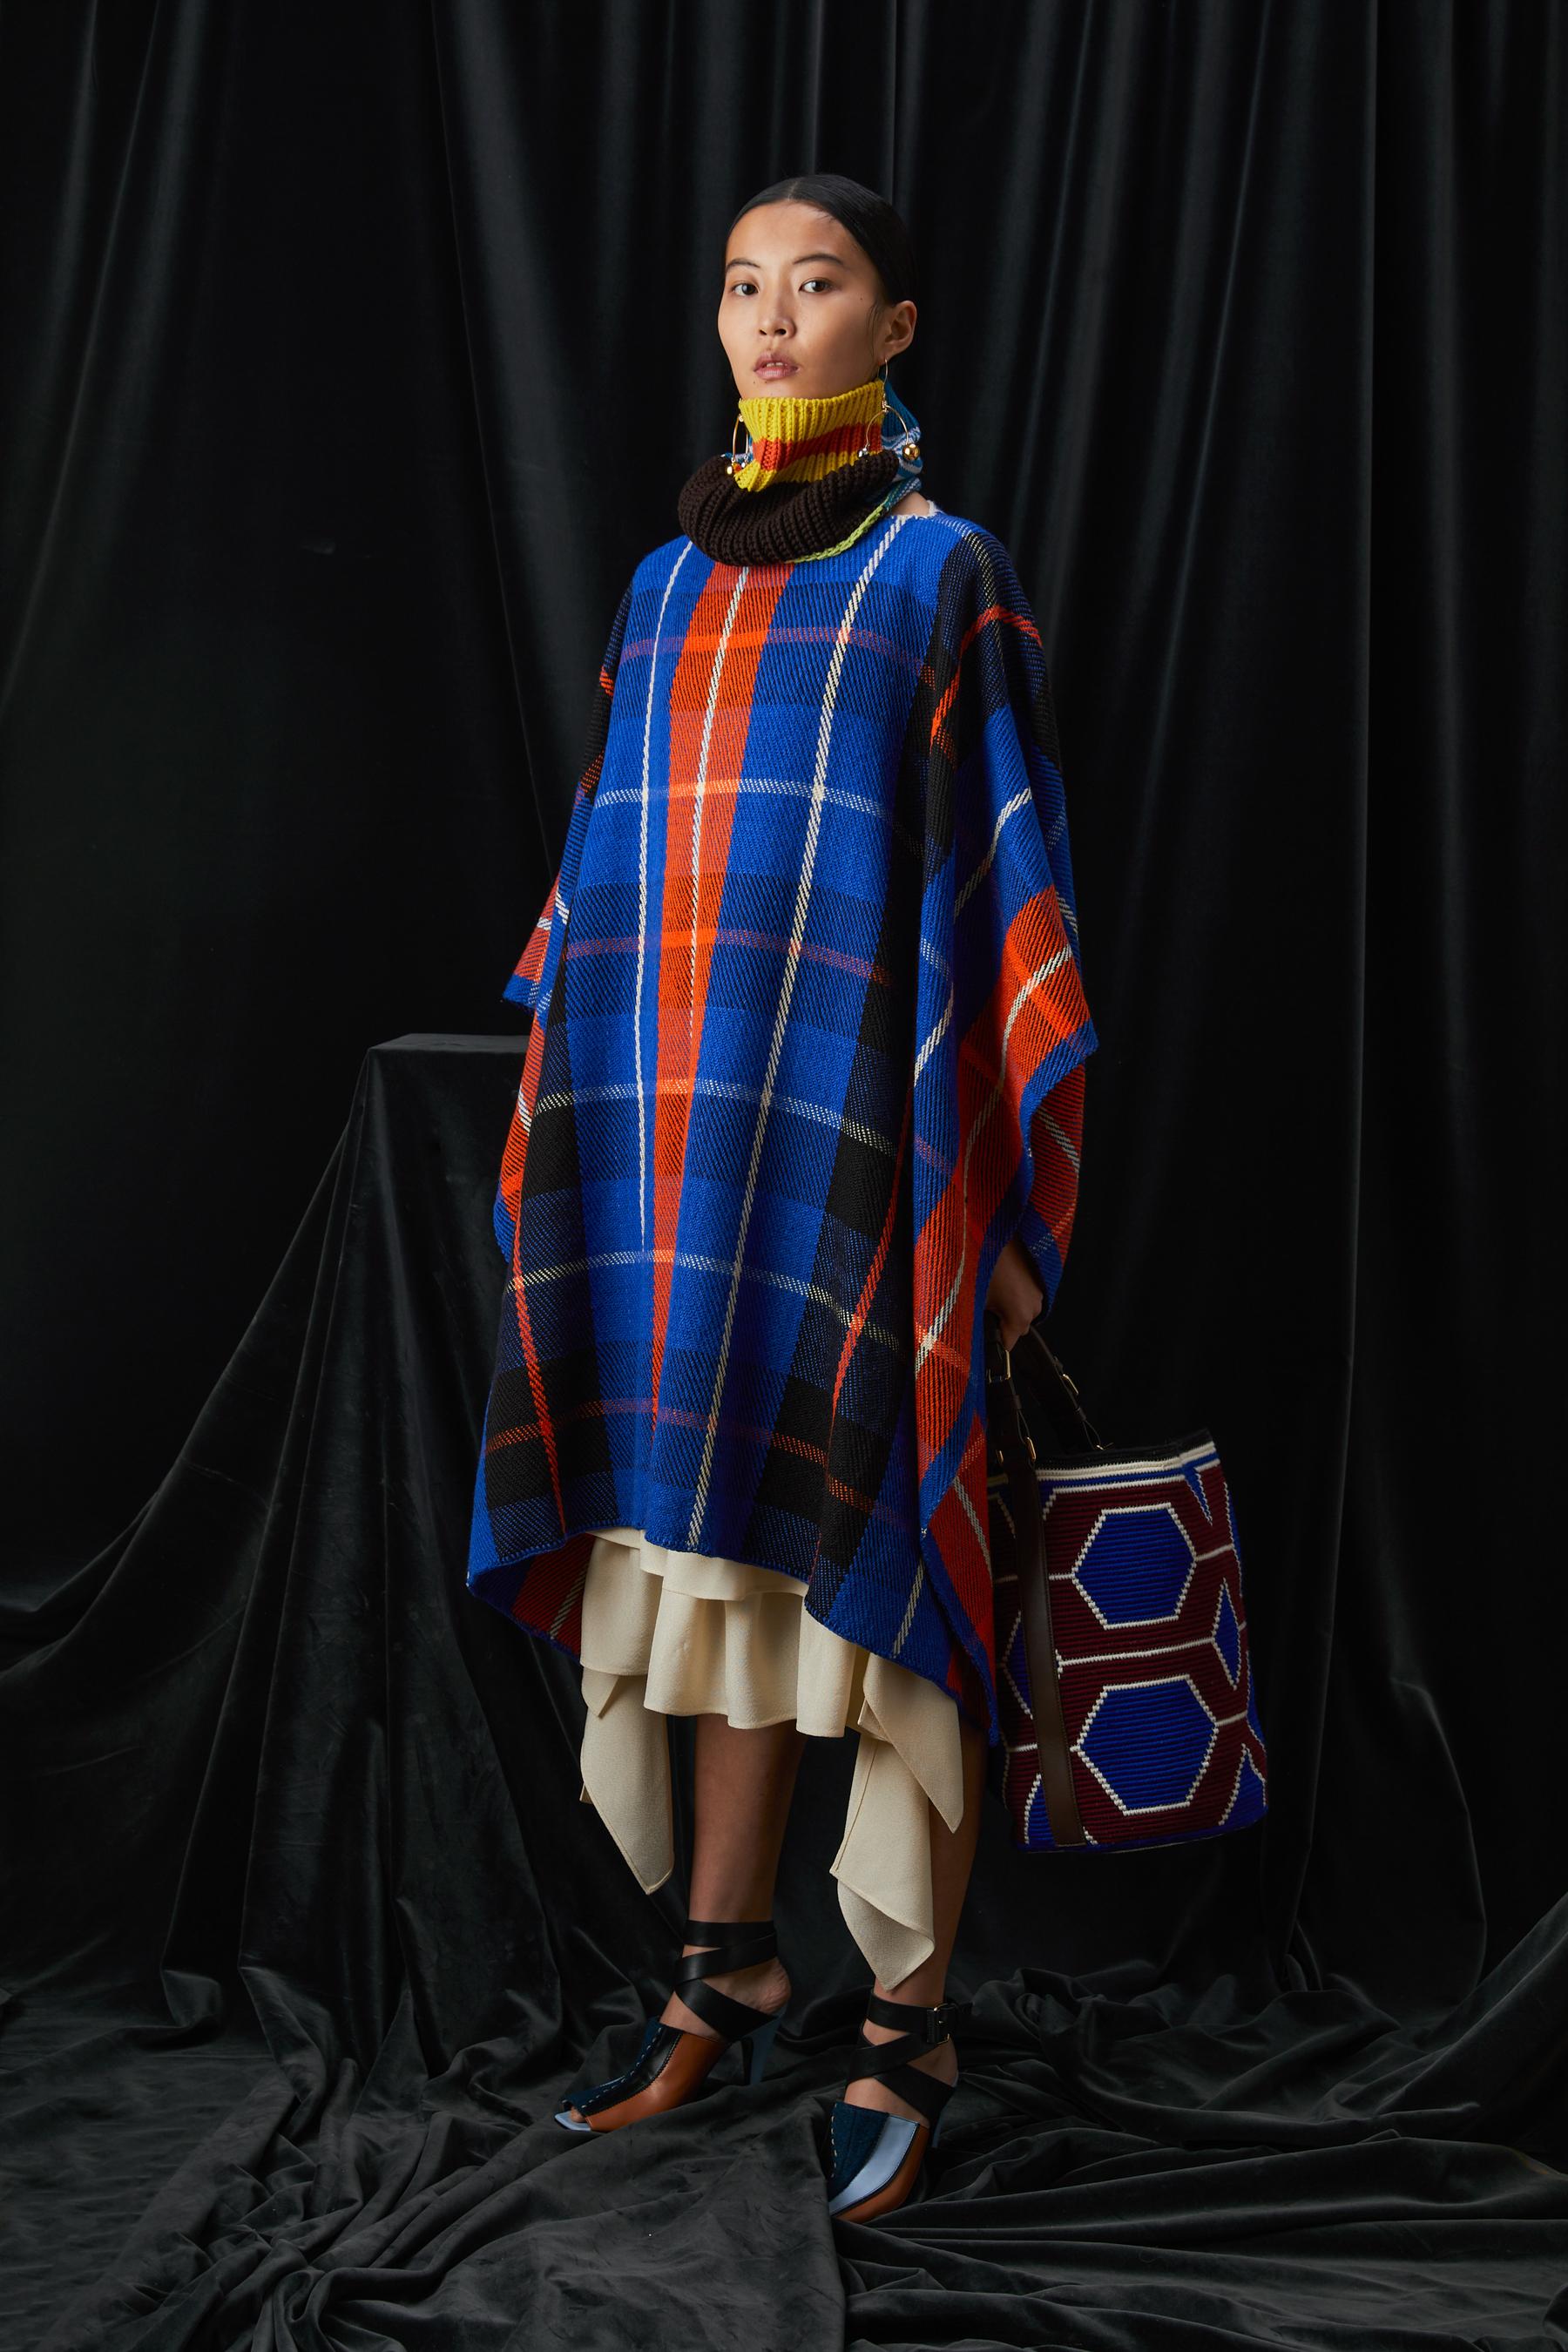 Colville Fall 2021 Fashion Show